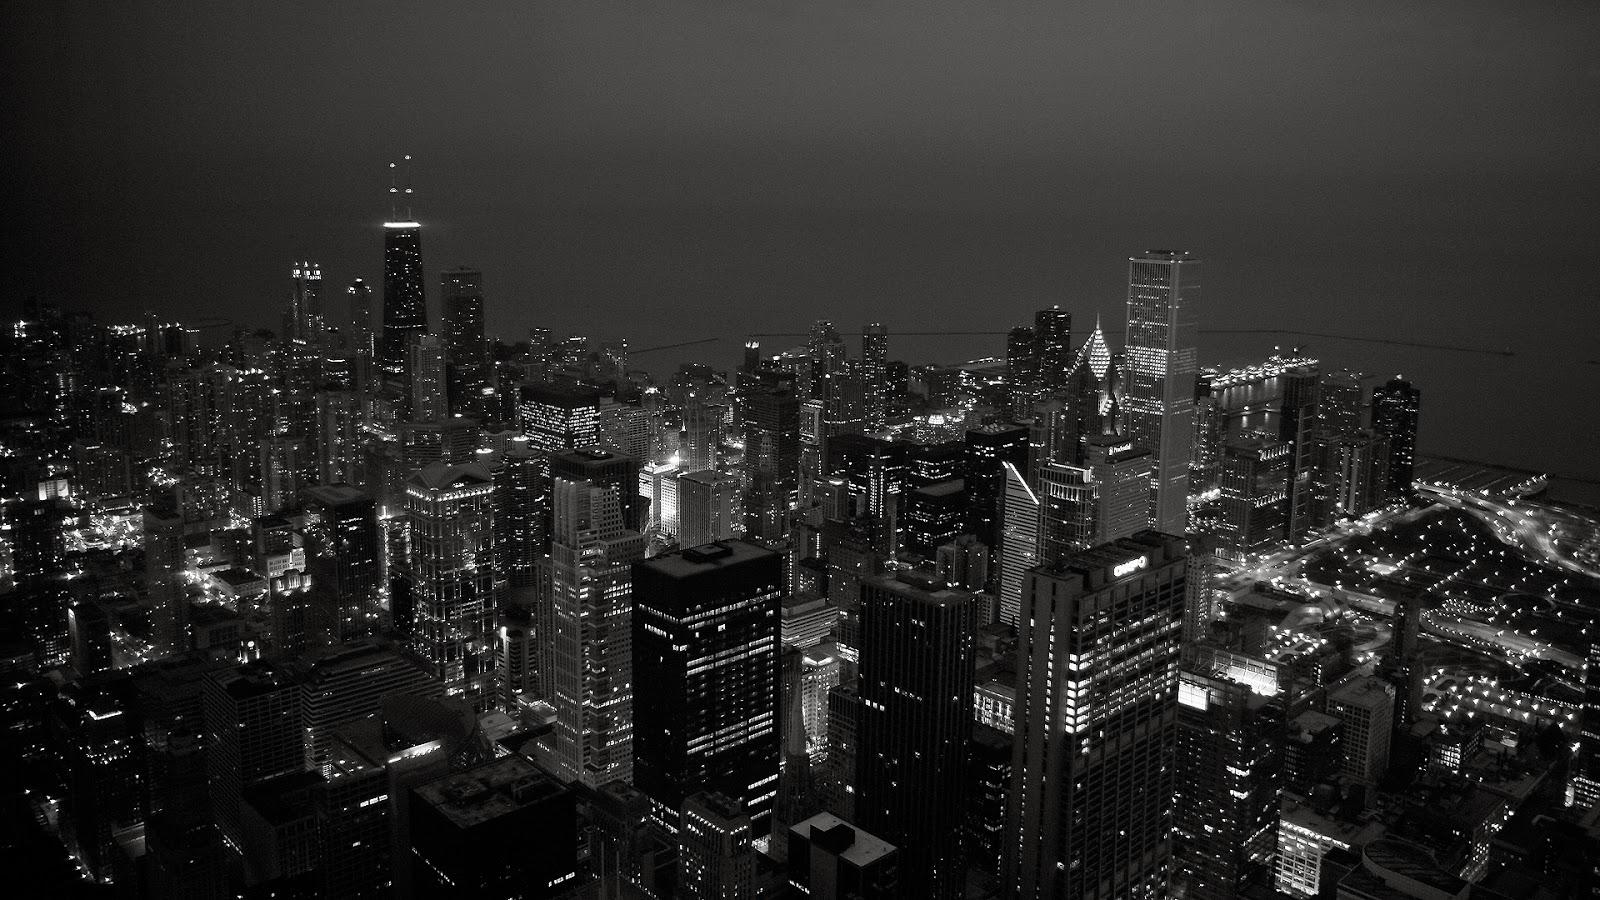 city at night live wallpaper   Best Wallpaper Views